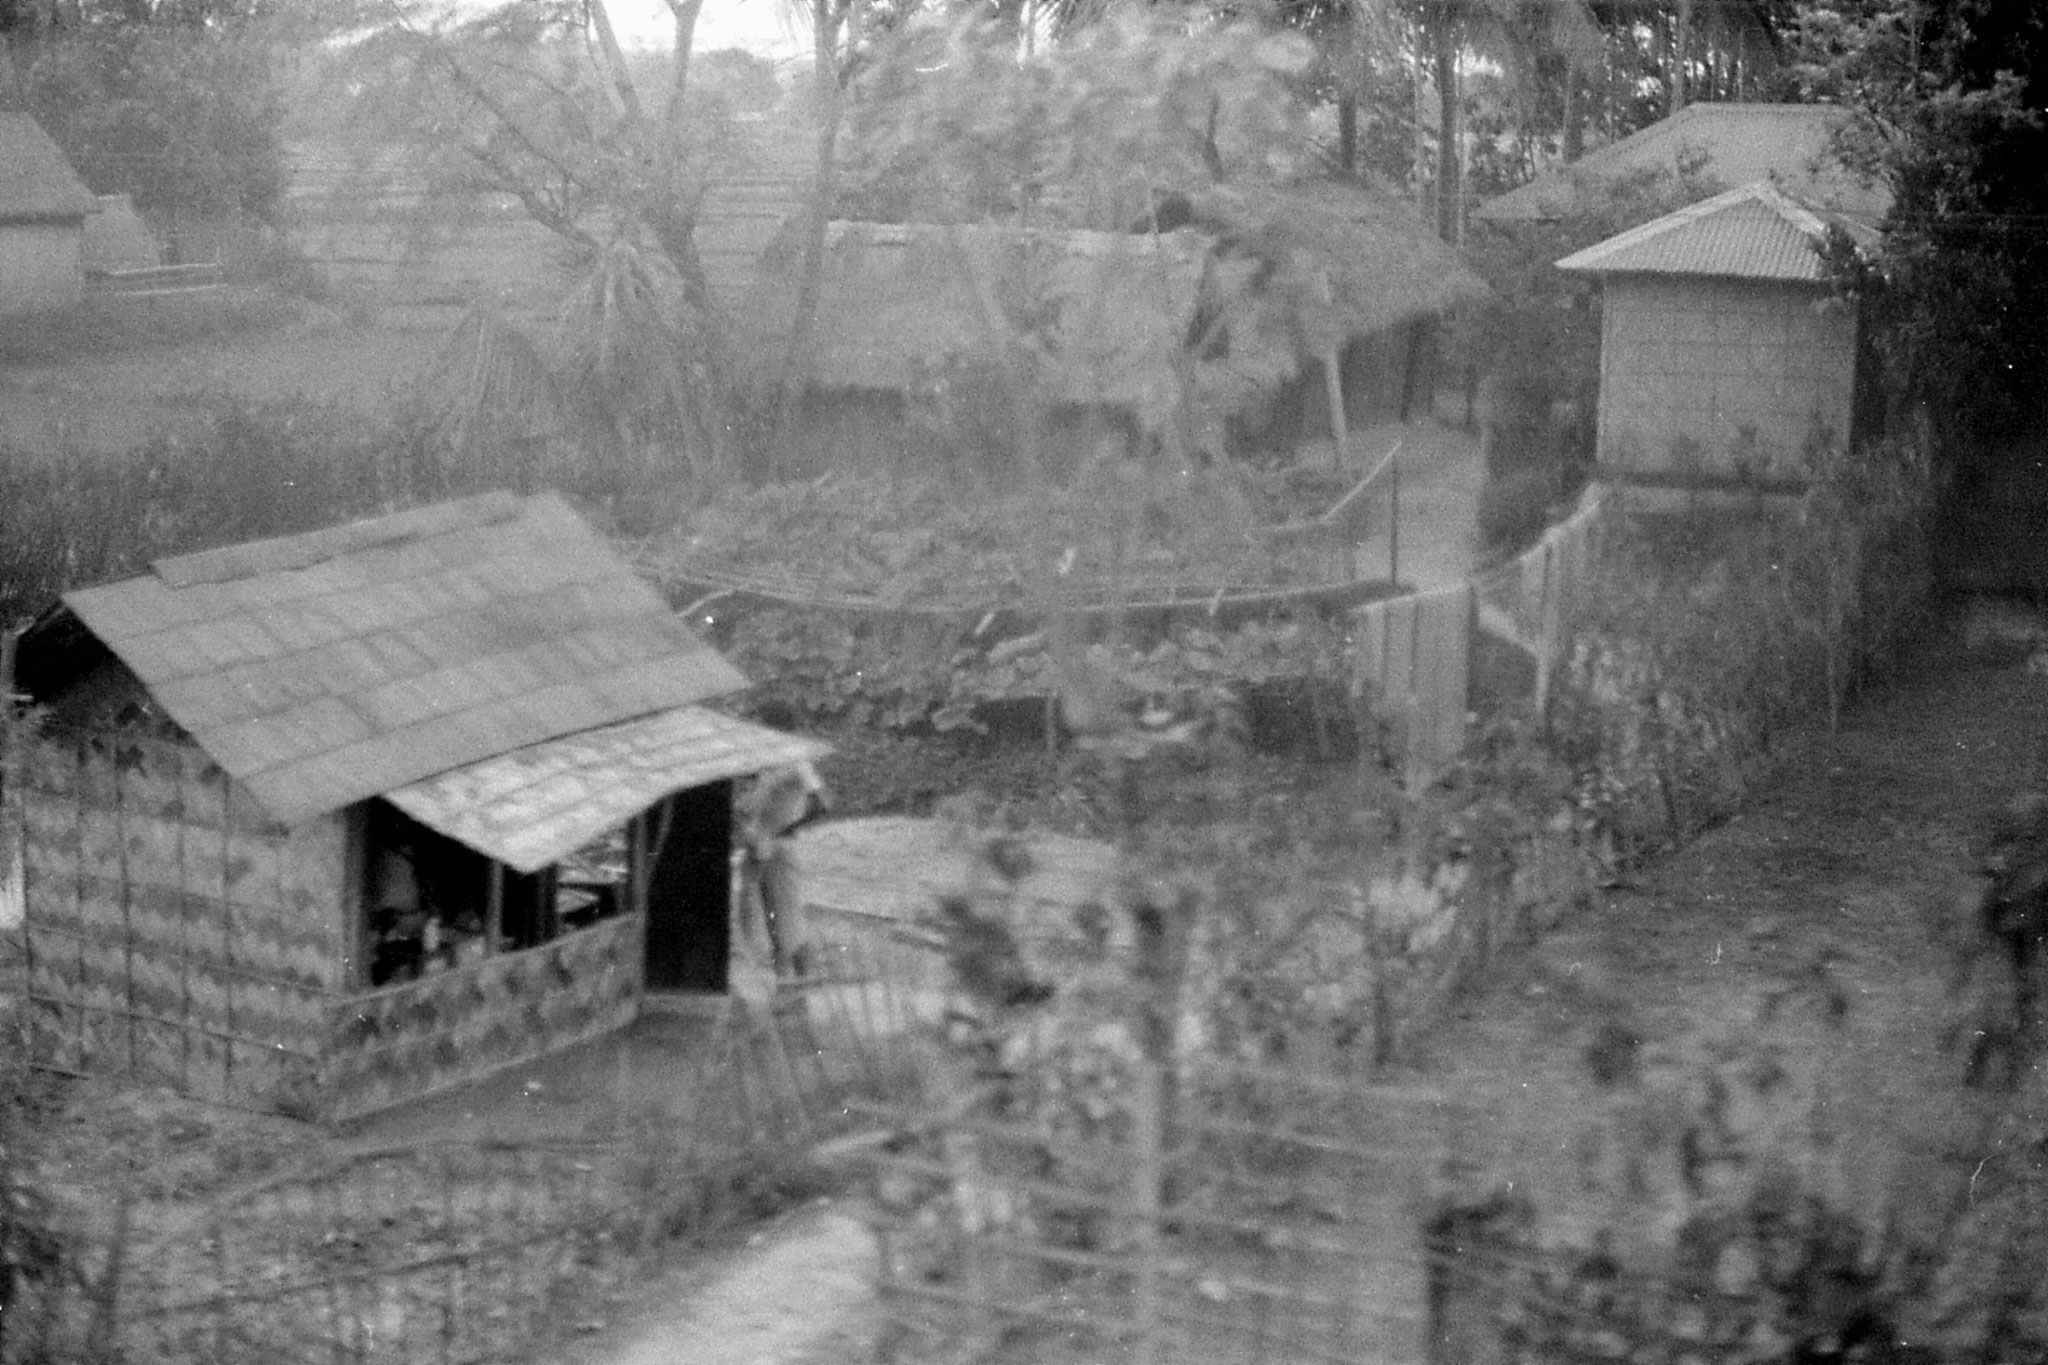 11/4/1990: 34: on train to Silchar - Jagirand